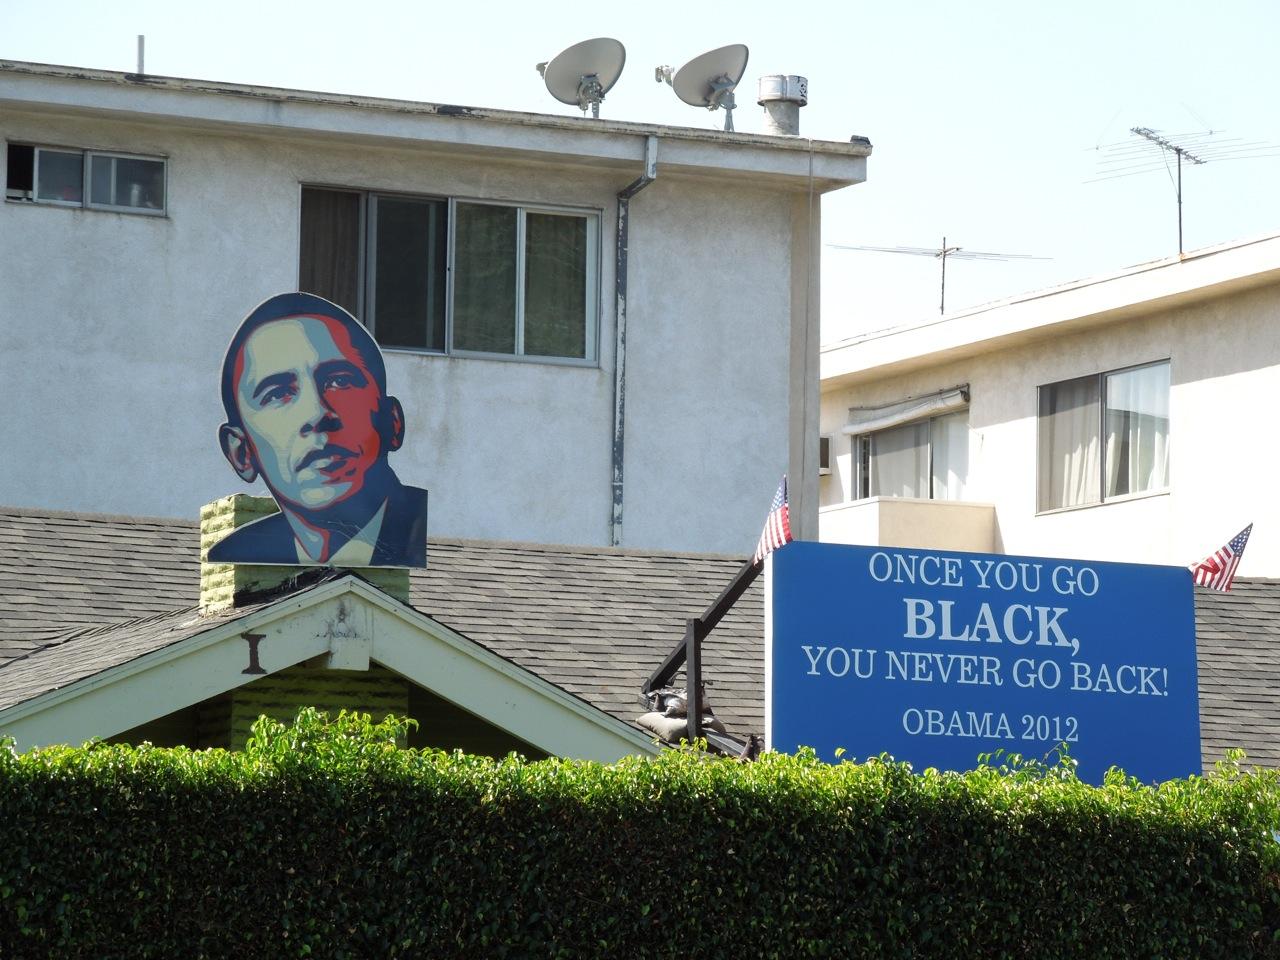 http://1.bp.blogspot.com/-O86ER6xbrC8/UD_VfWvioWI/AAAAAAAAyPE/UpAAik_ZysQ/s1600/obama+once+you+go+black+rooftop.jpg